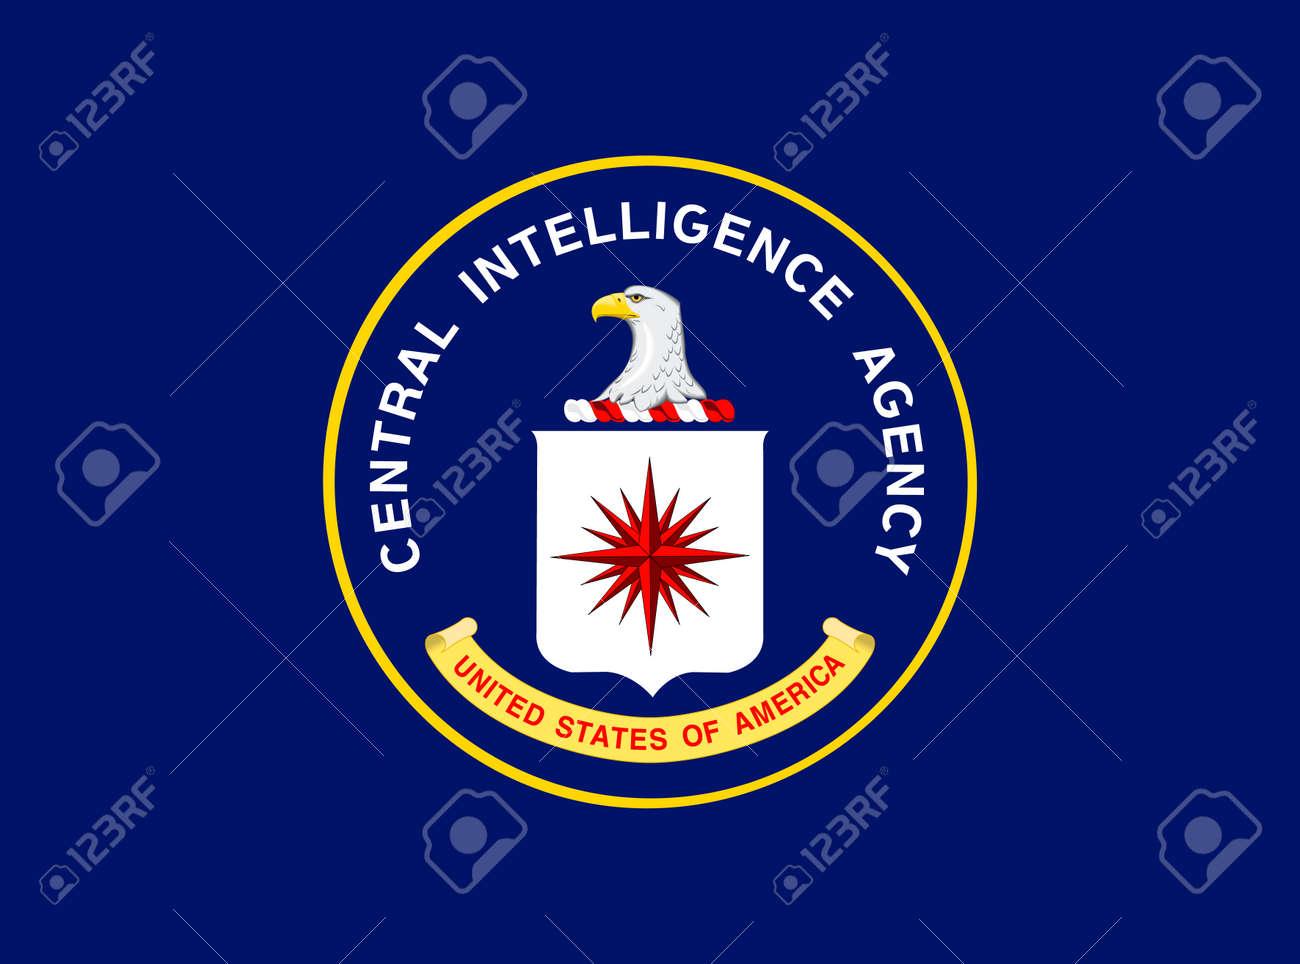 US Central Intelligence Agency flag, United States of America, vector illustration - 172886207